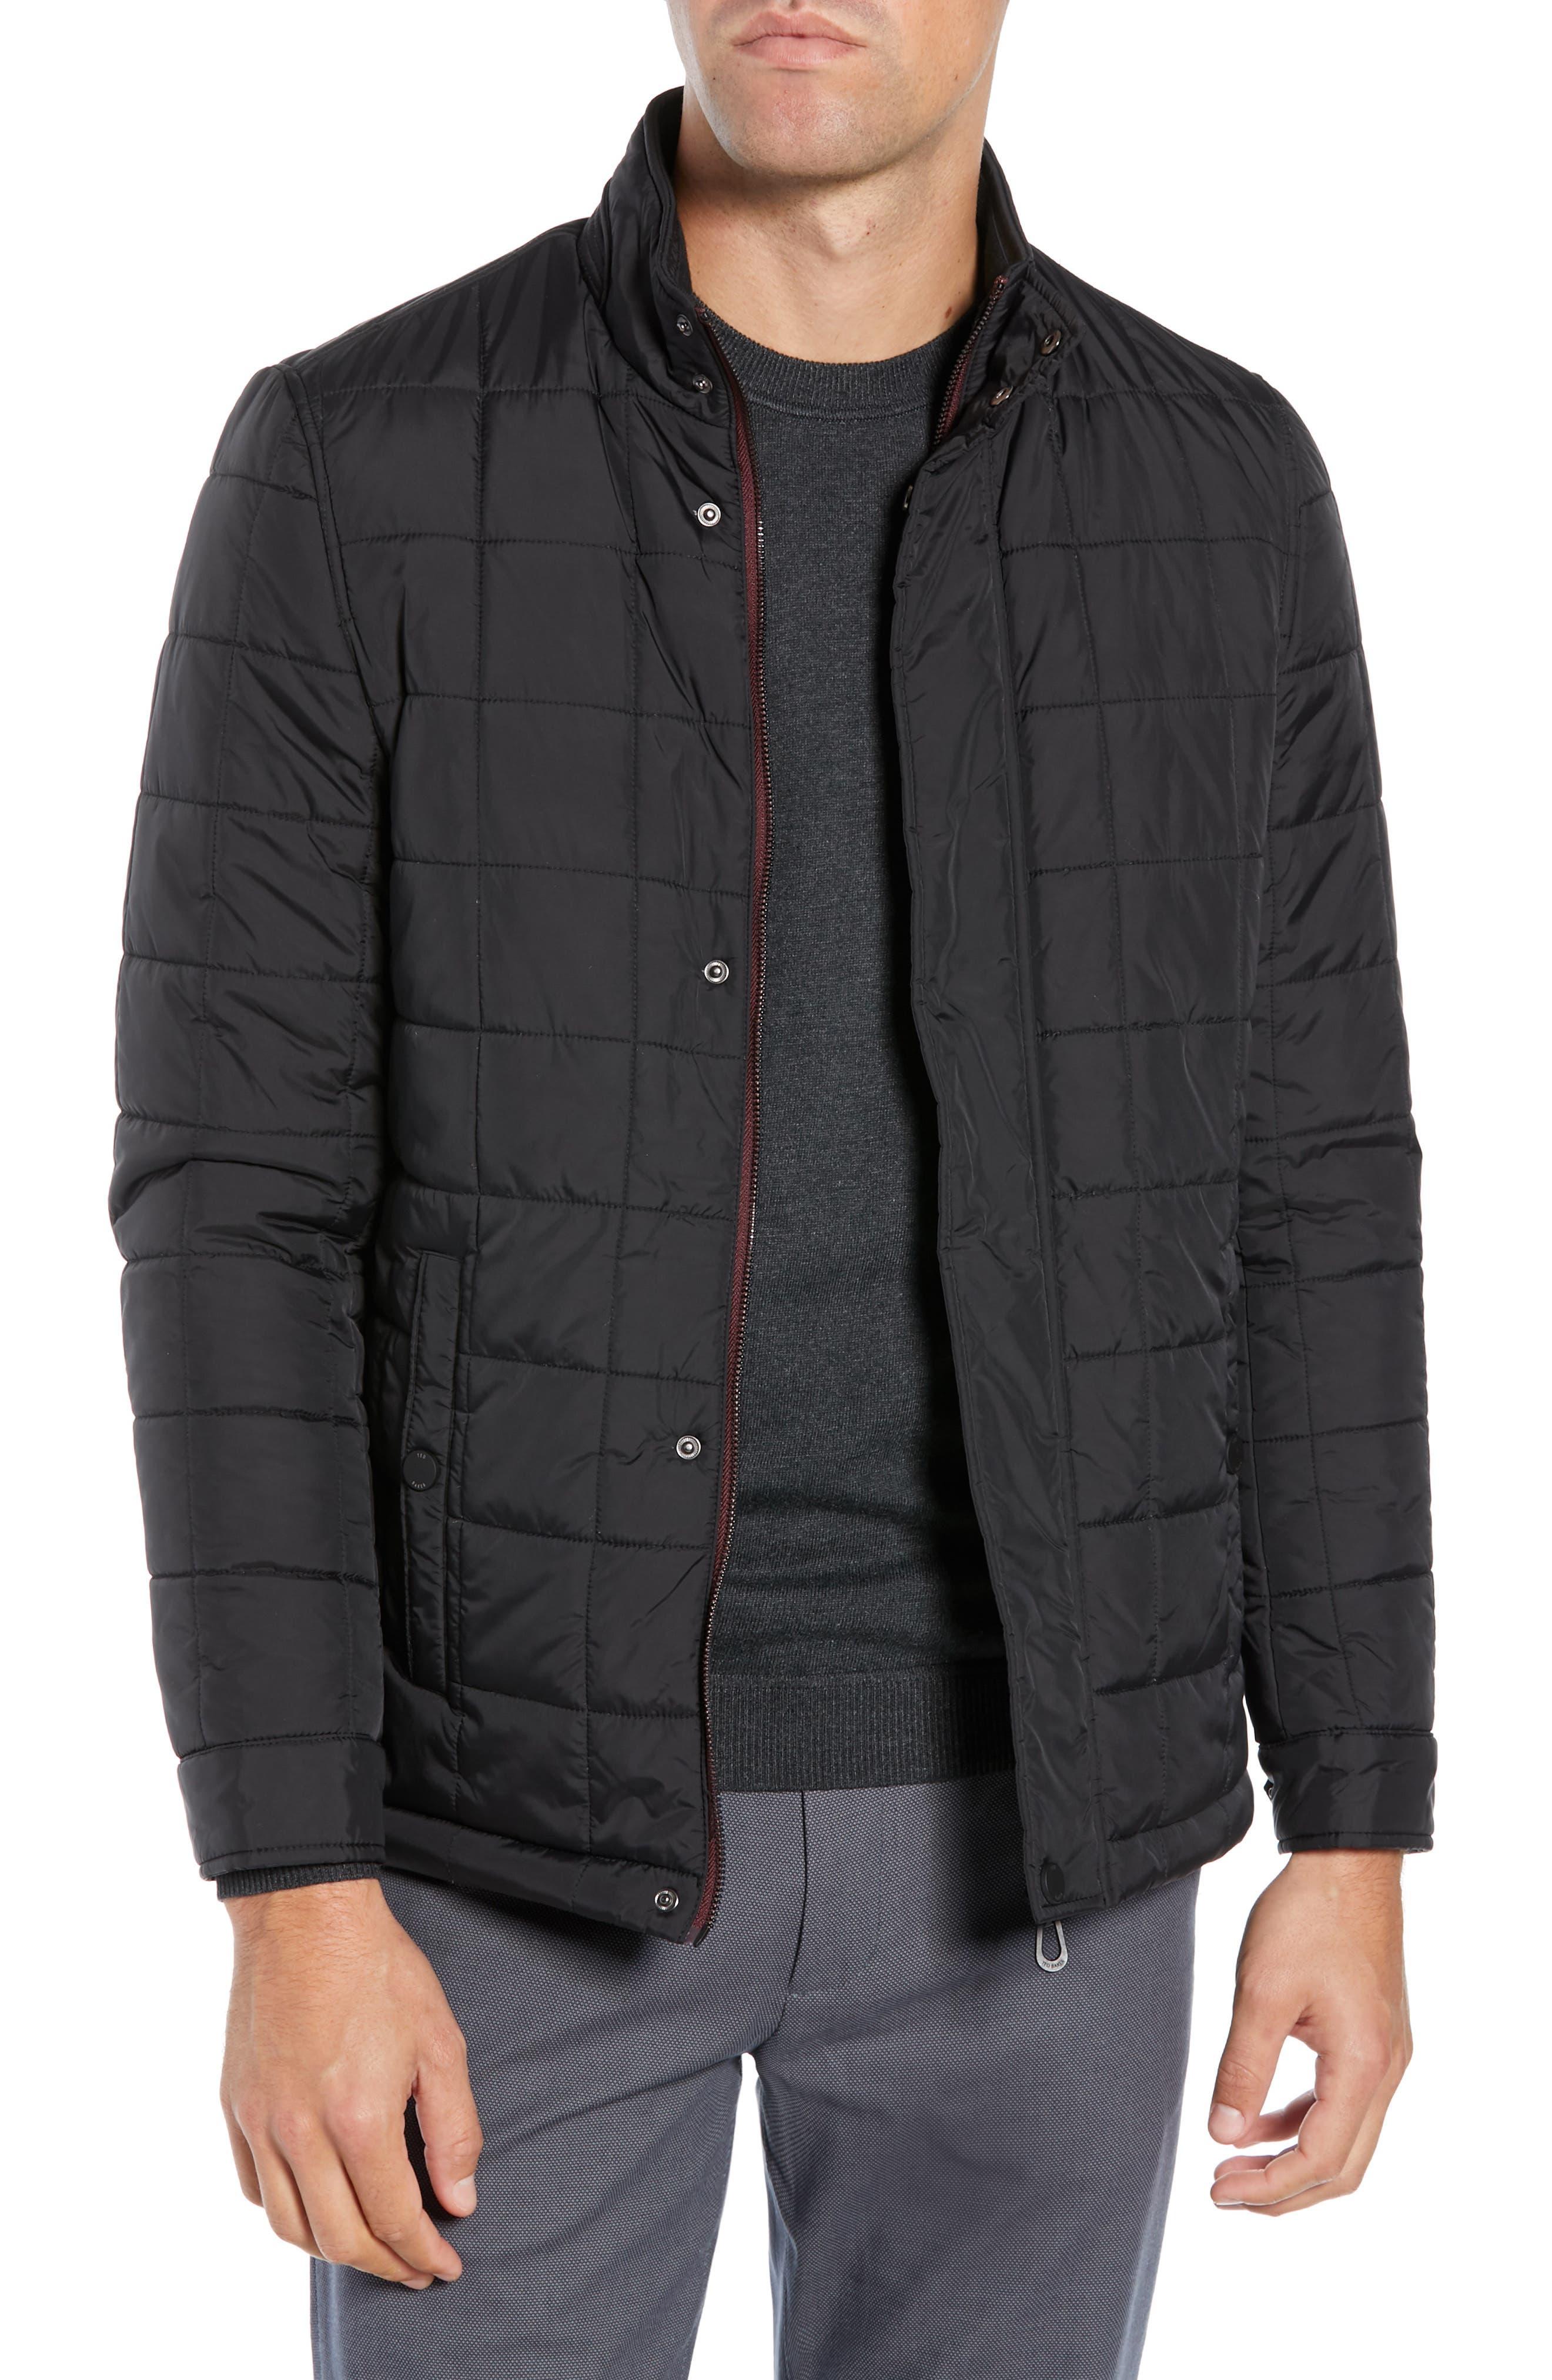 Lesta Quilted Slim Fit Jacket,                             Main thumbnail 1, color,                             BLACK